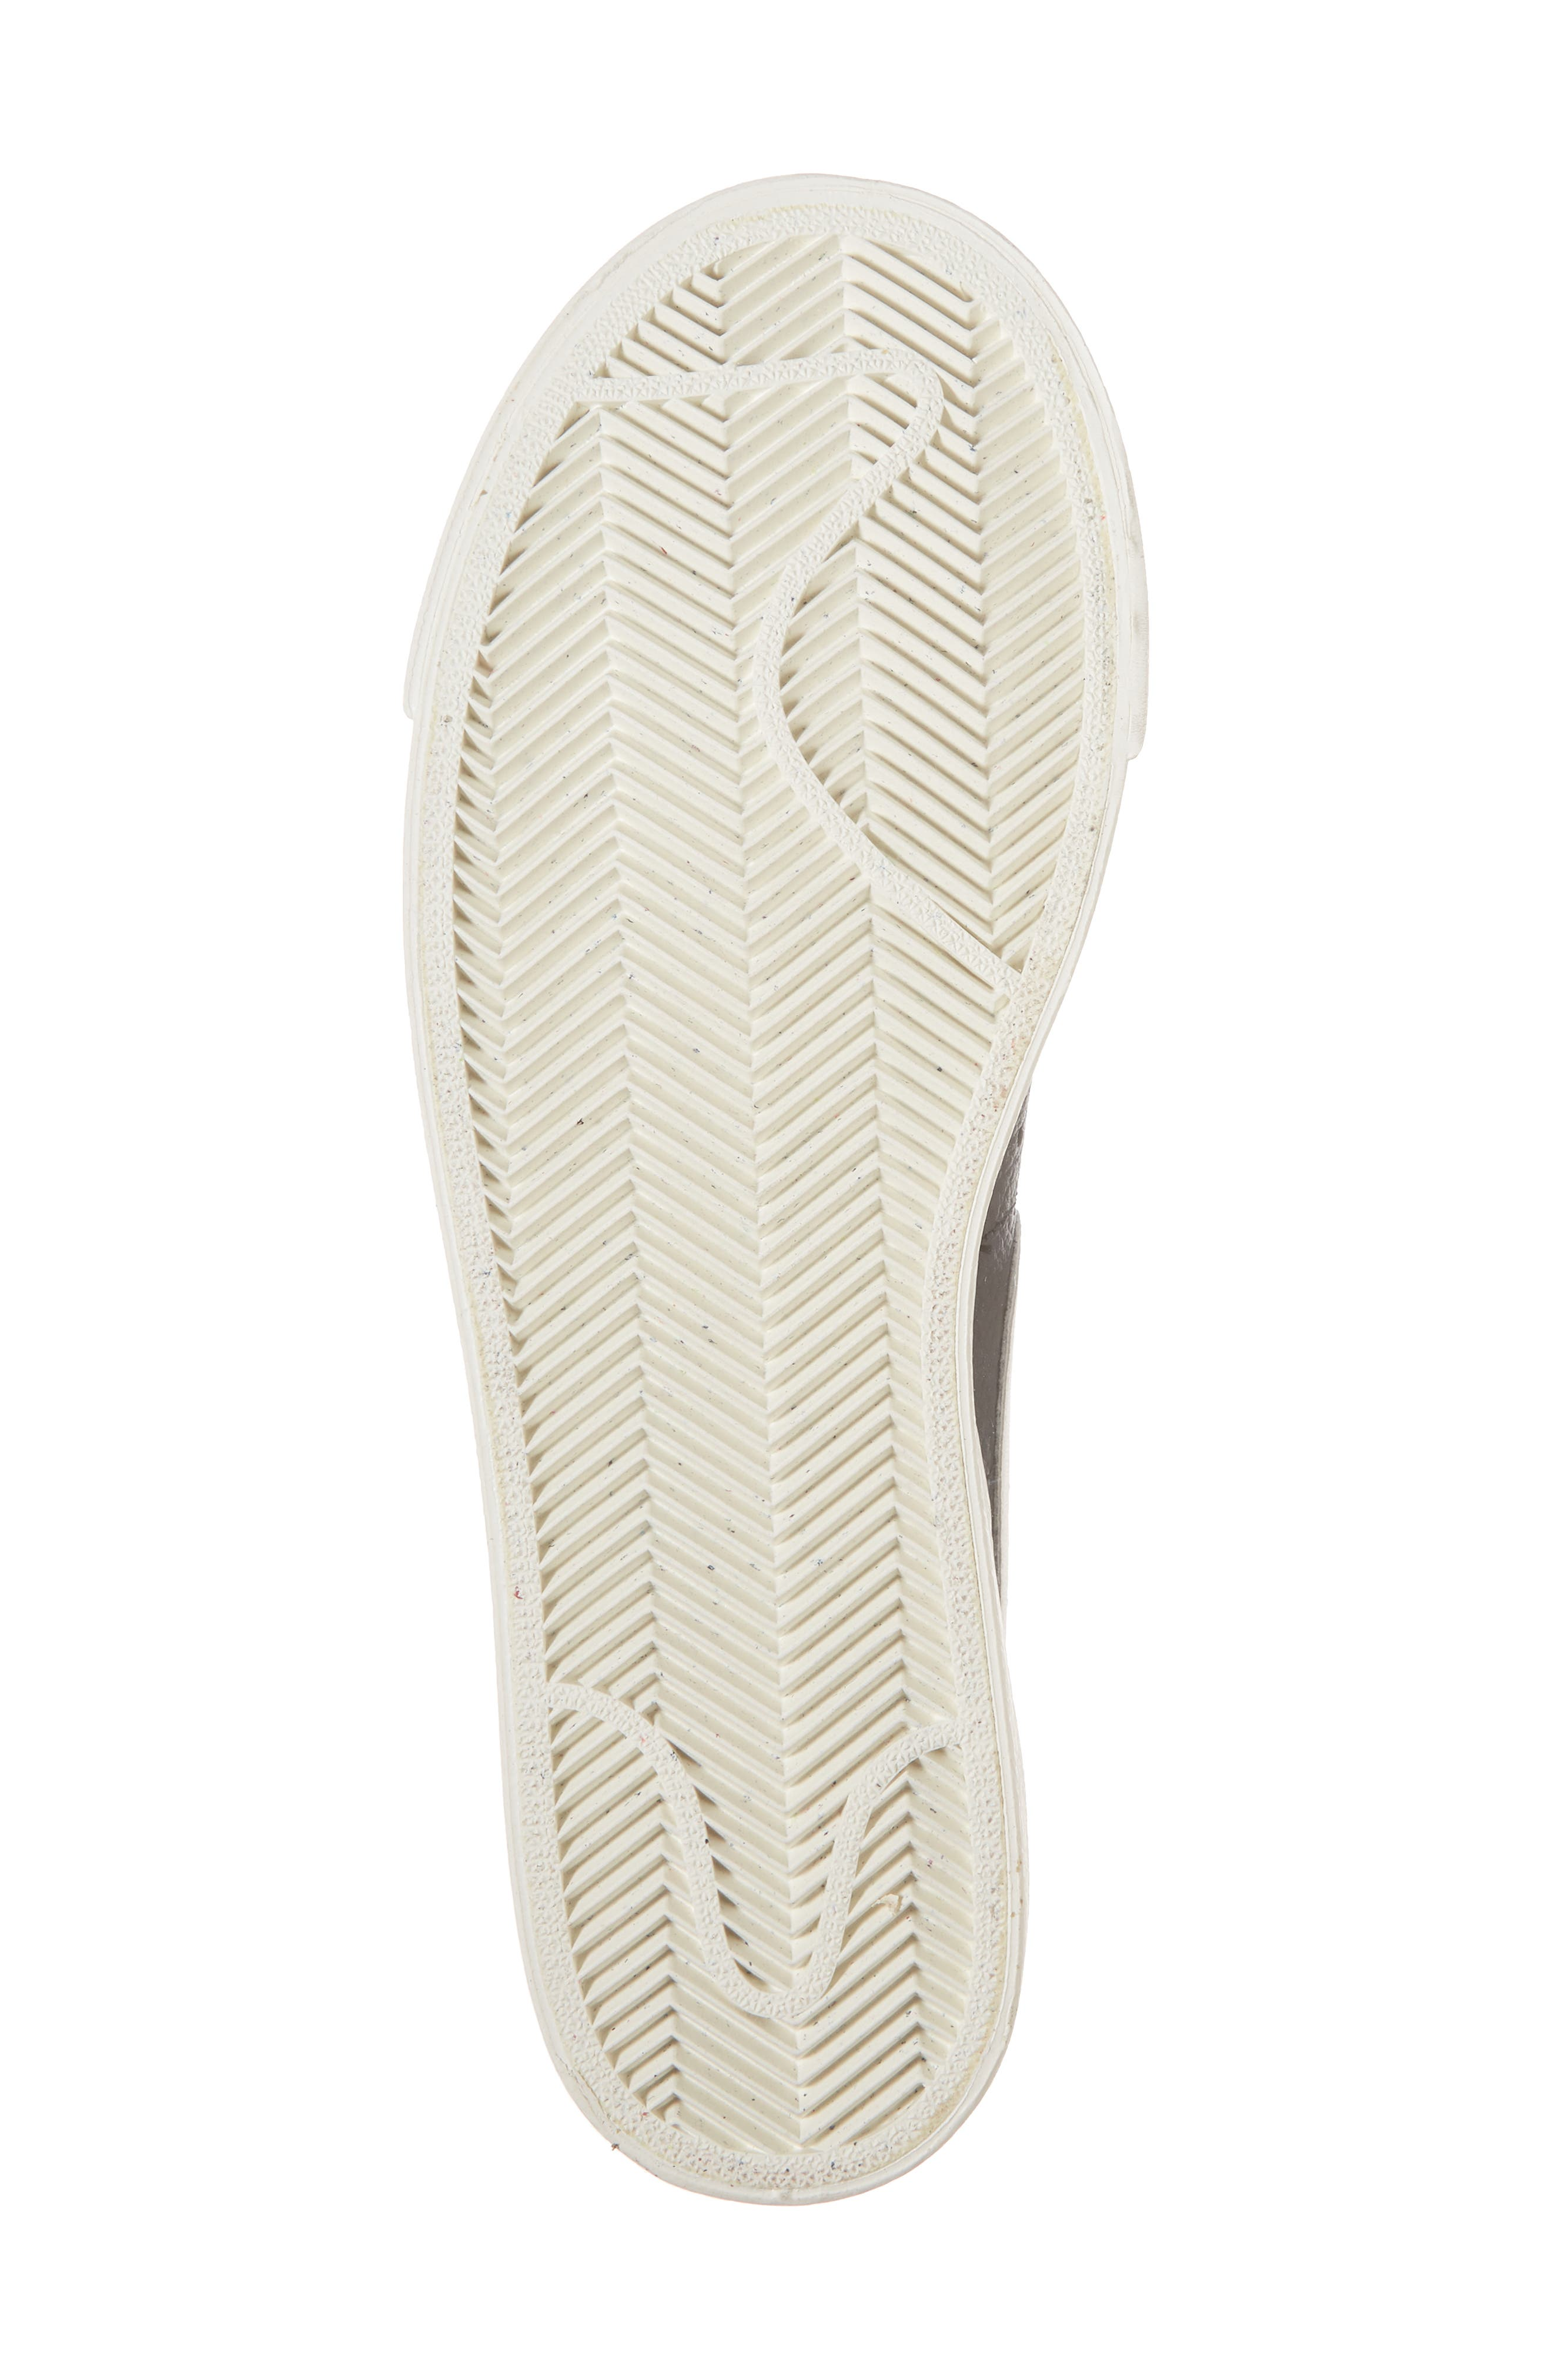 Blazer Premium Low Sneaker,                             Alternate thumbnail 6, color,                             004